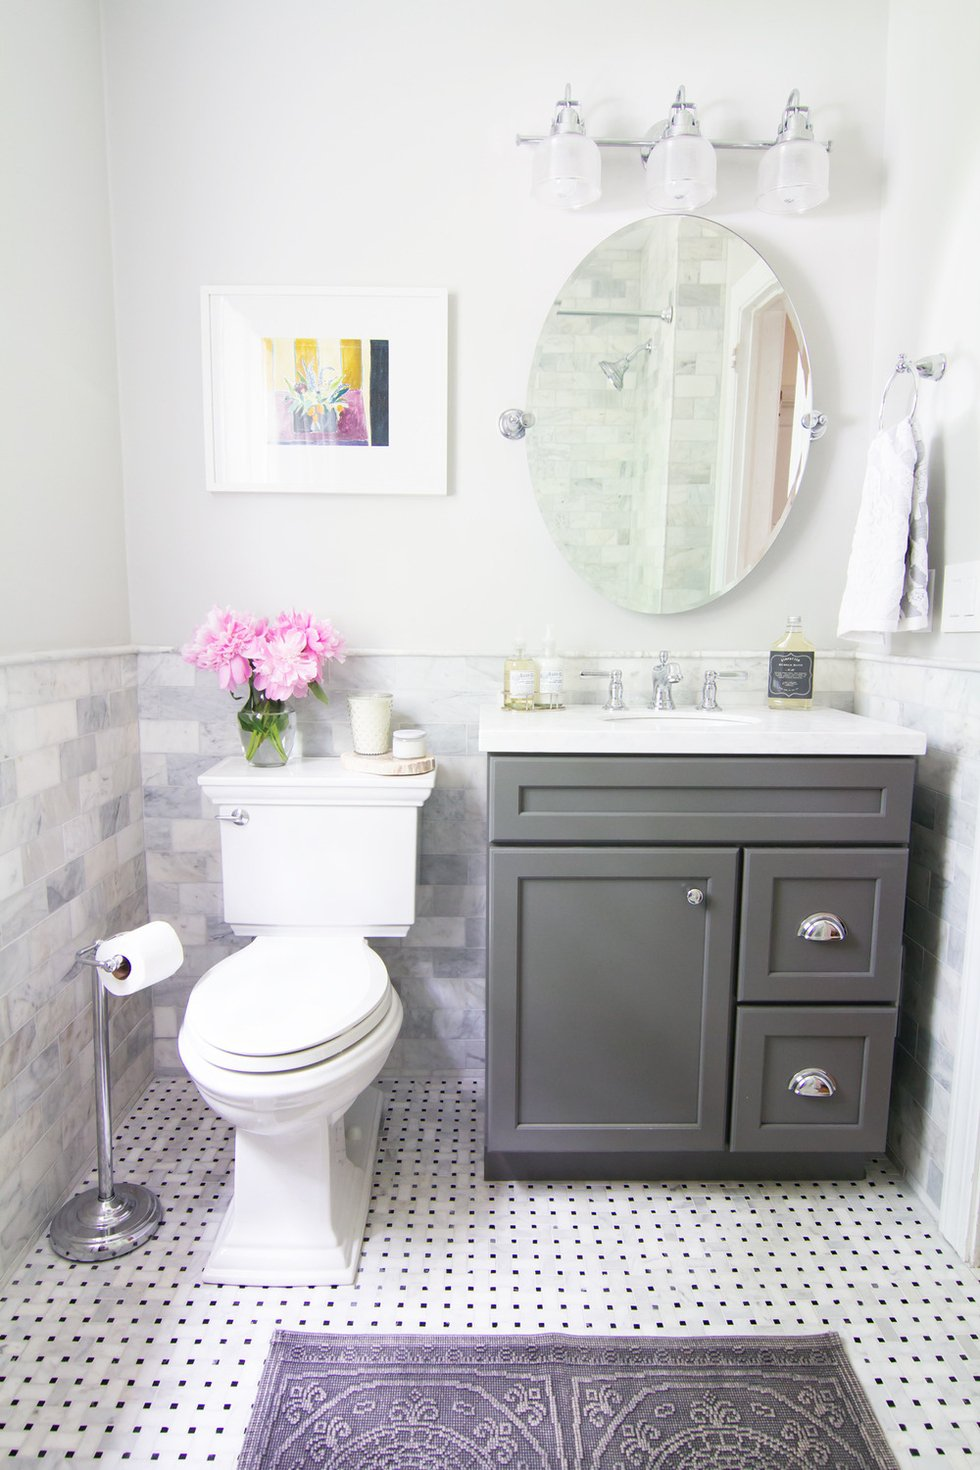 20 Stunning Small Bathroom Designs on Small Space Small Bathroom Tiles Design  id=59484